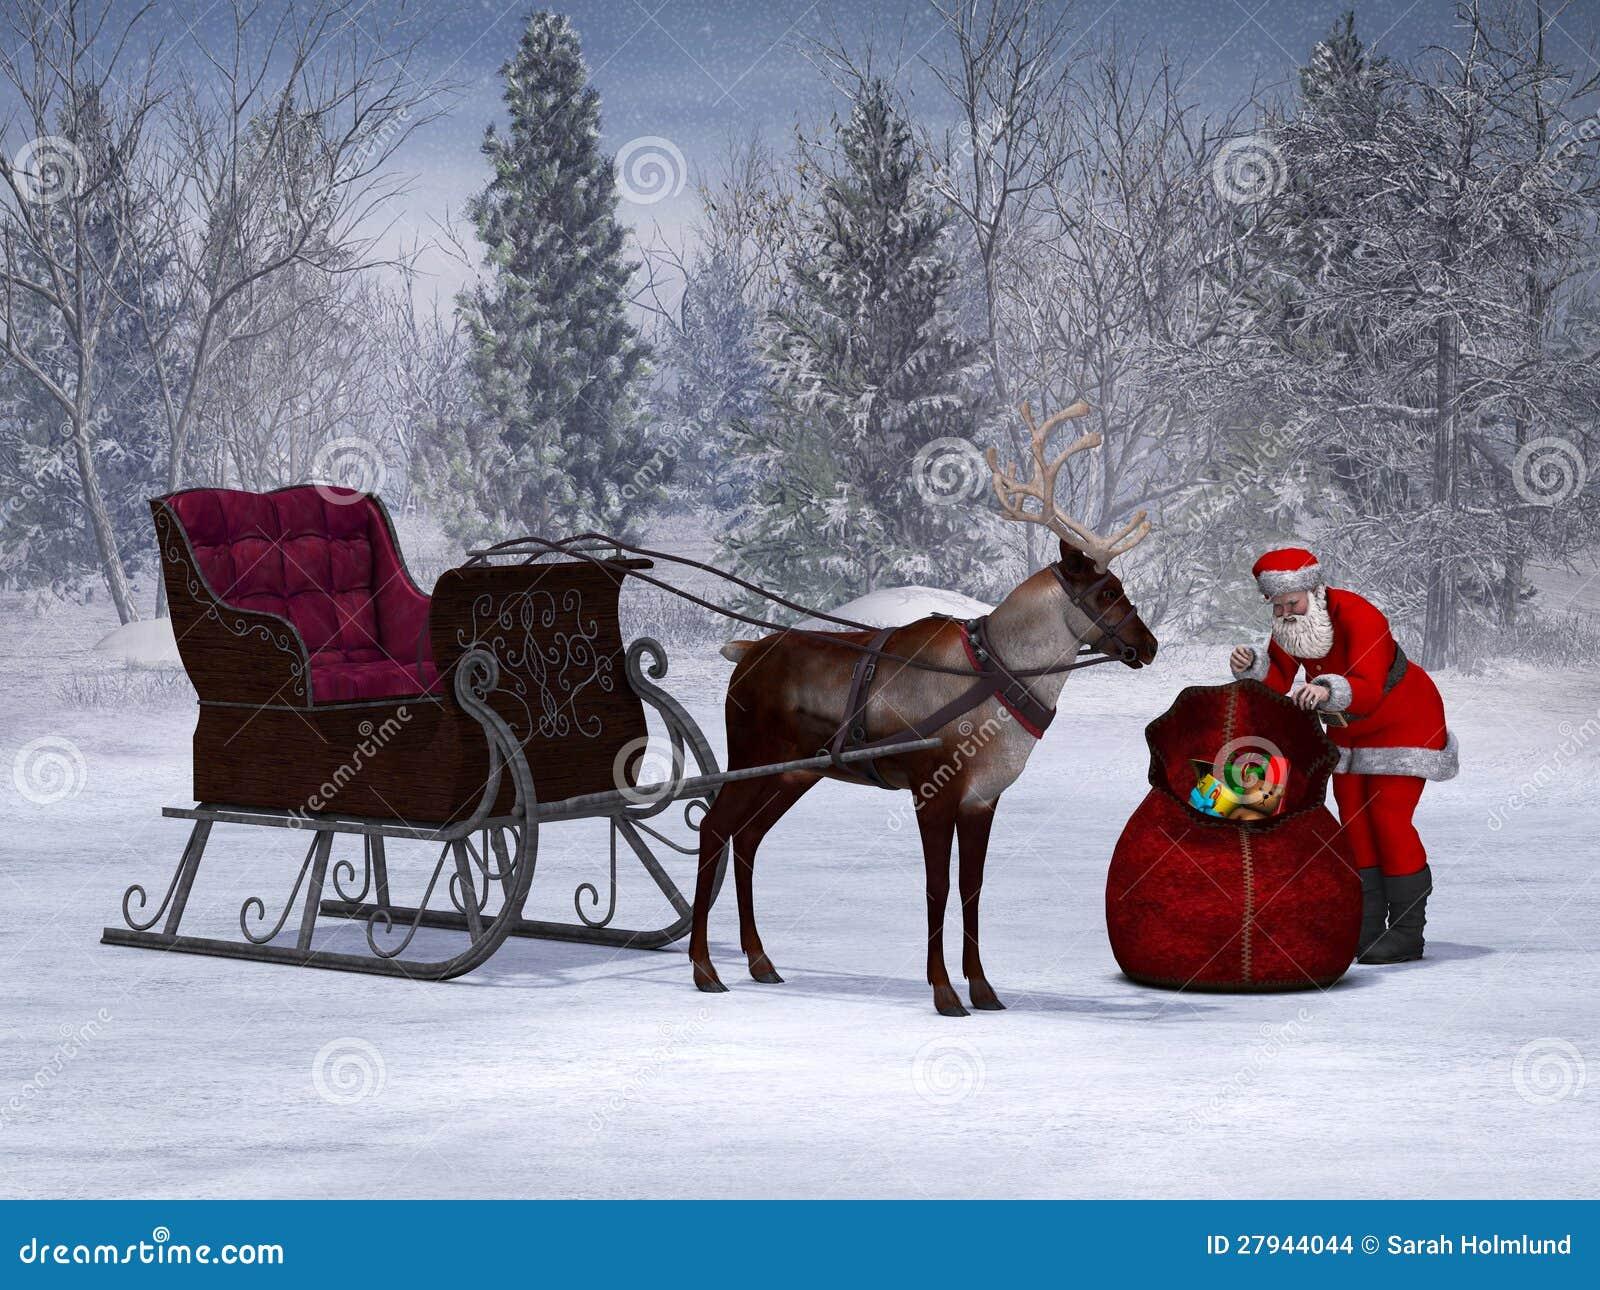 Santa Preparing His Sleigh Ride. Stock Images - Image: 27944044